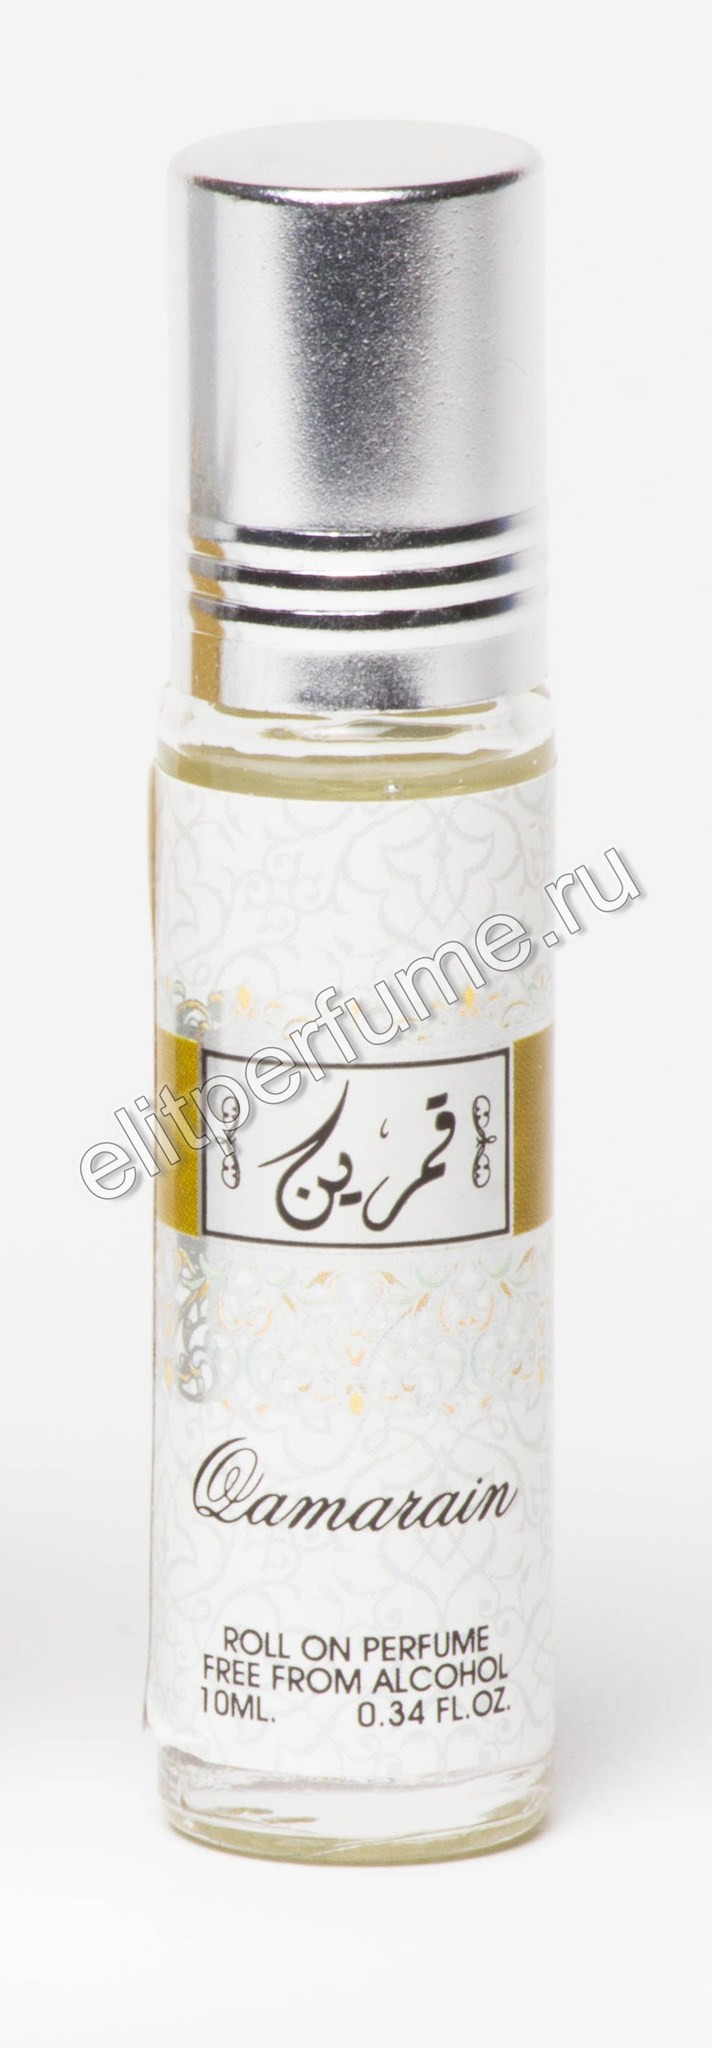 Qamarain Камарайн 10 мл арабские масляные духи от Ард Аль Заафаран Ard Al Zaafaran